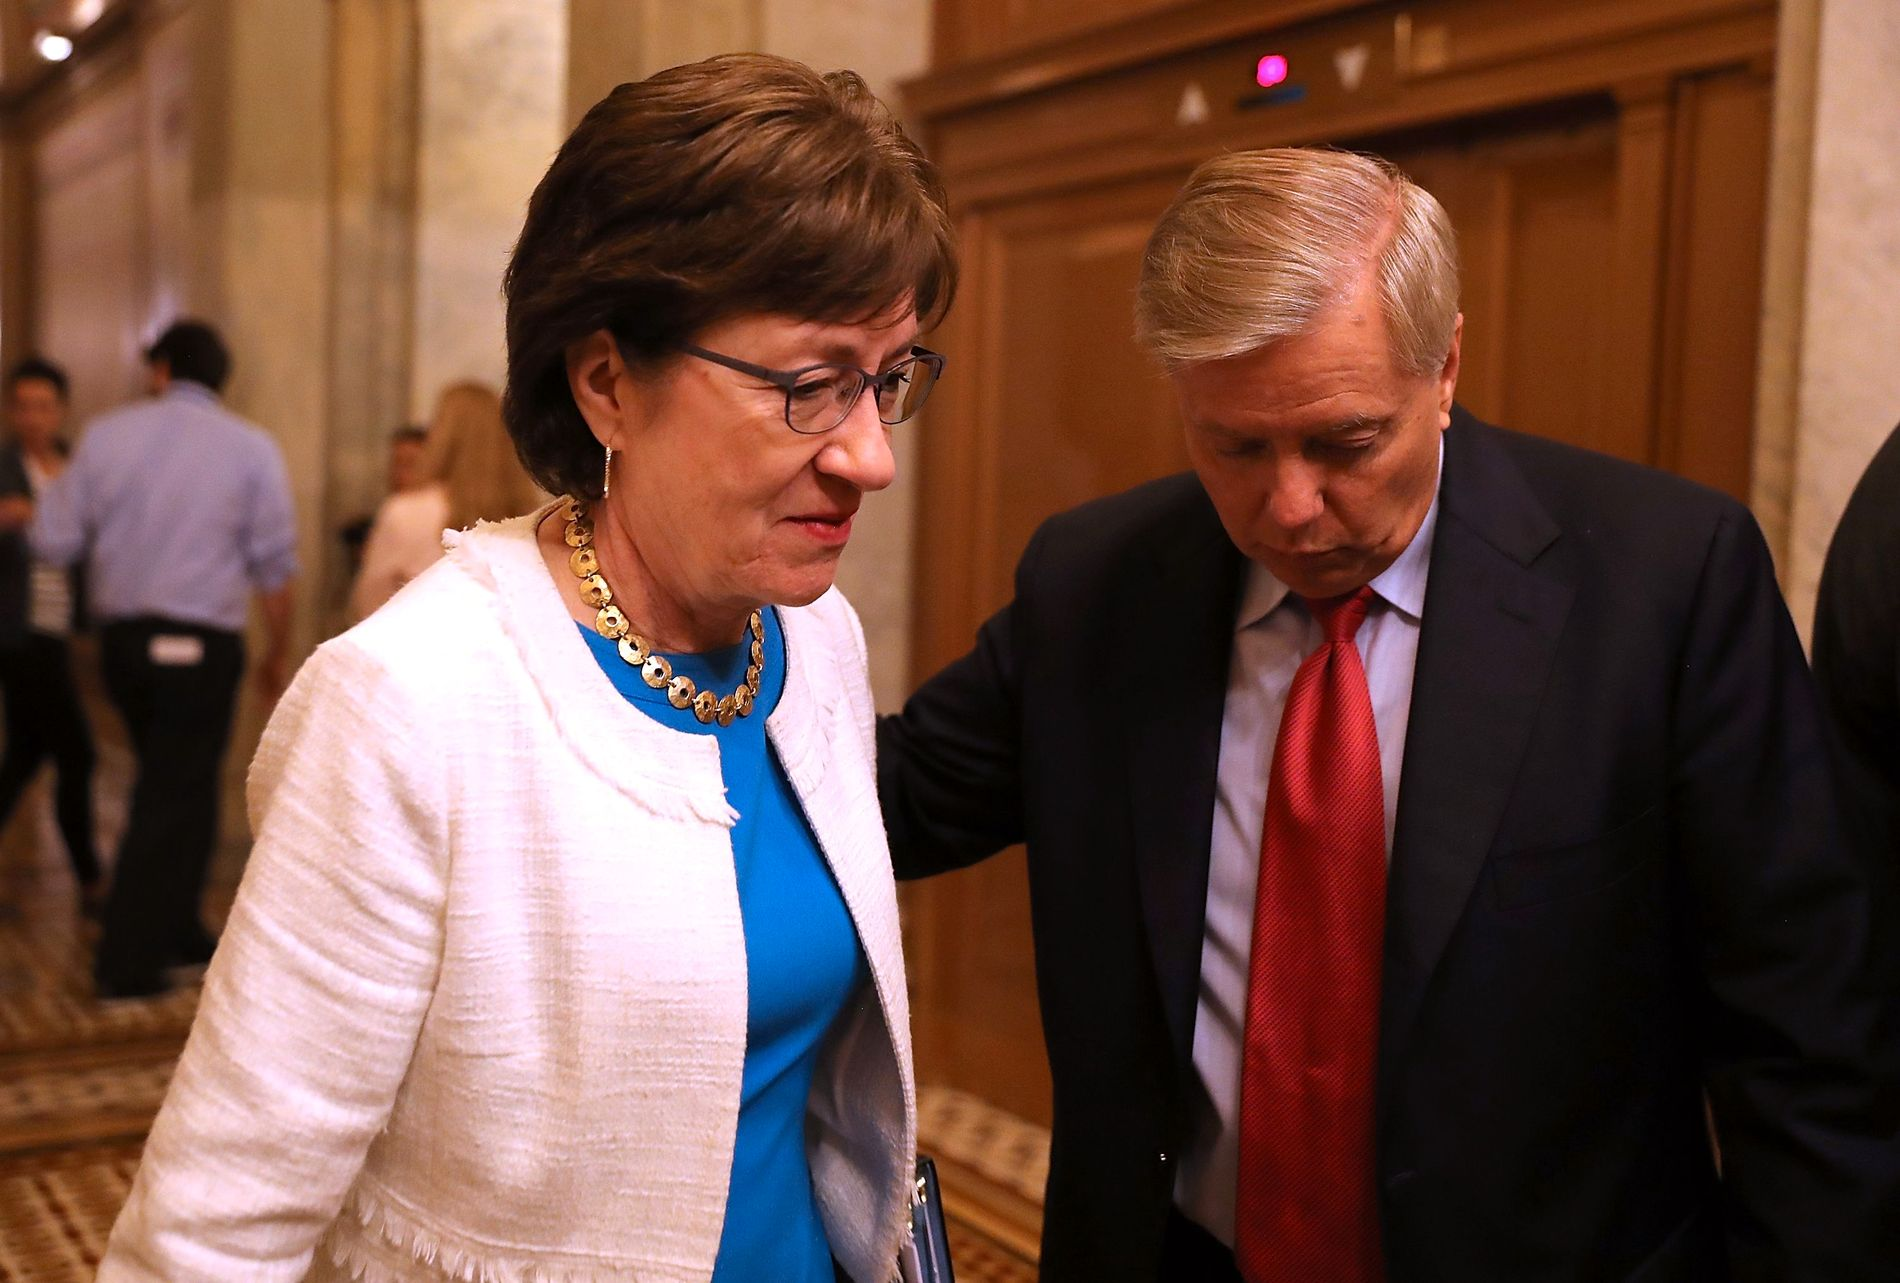 HELSE-TRØBBEL: Maine-senator Susan Collins stikker kjepper i hjulene for det nye forslaget til helsereform, som senator Lindsey Graham står bak.